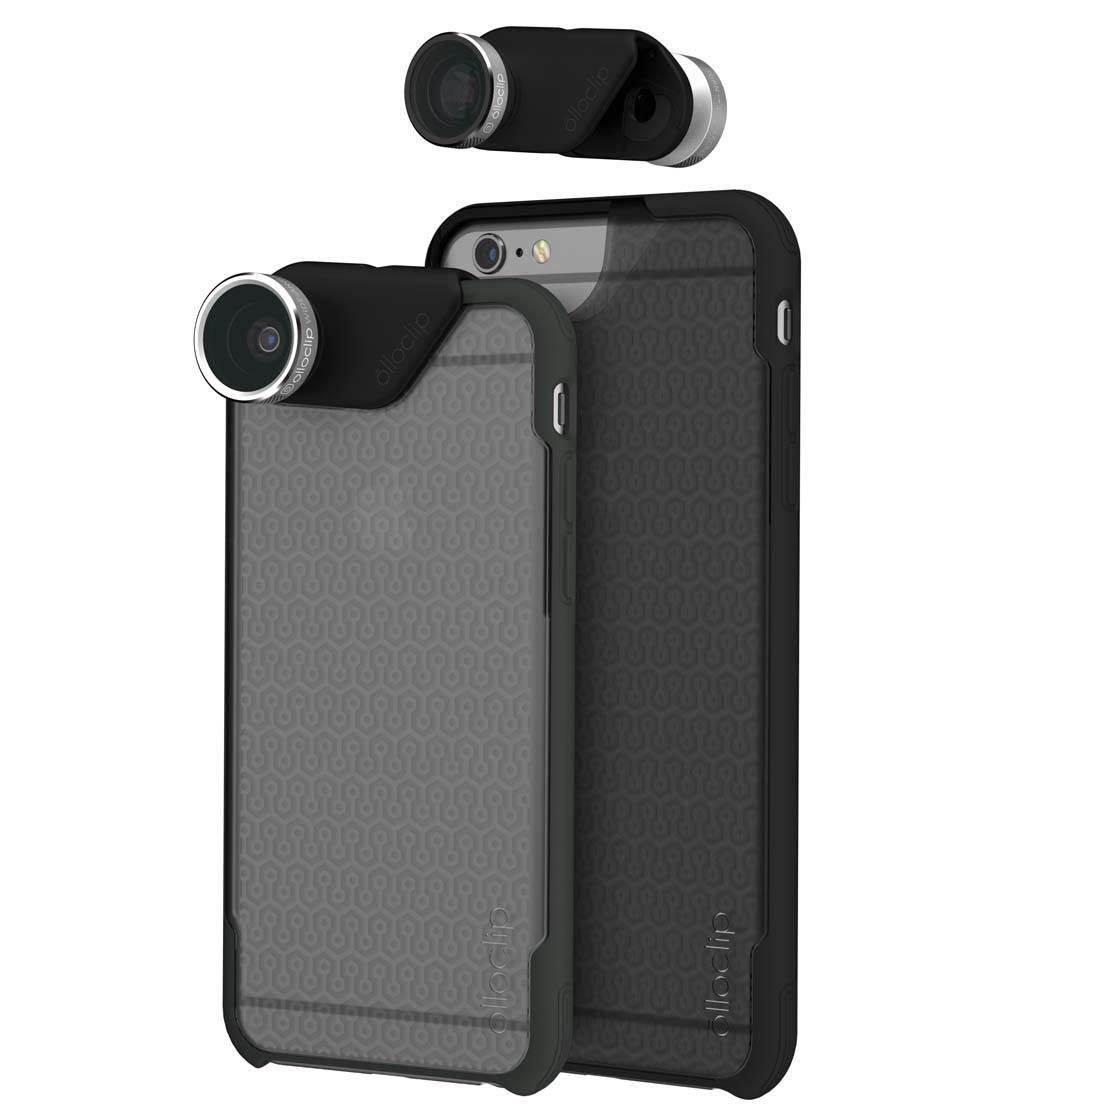 Olloclip iPhone Active Lens Ollocase 7